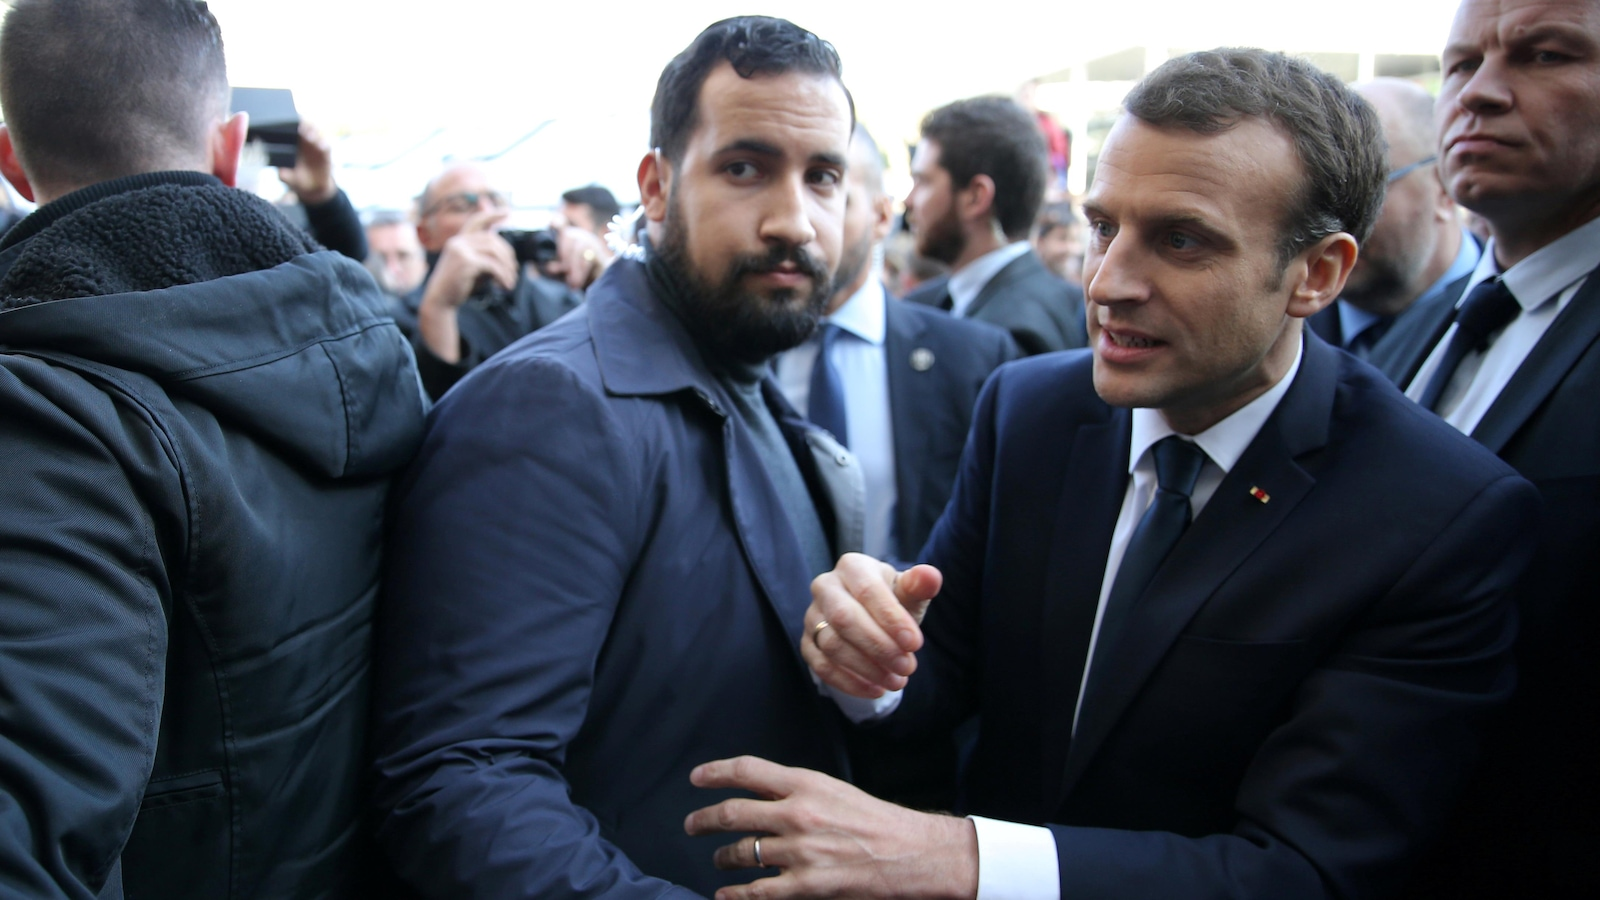 Alexandre Benalla met son bras devant Emmanuel Macron.